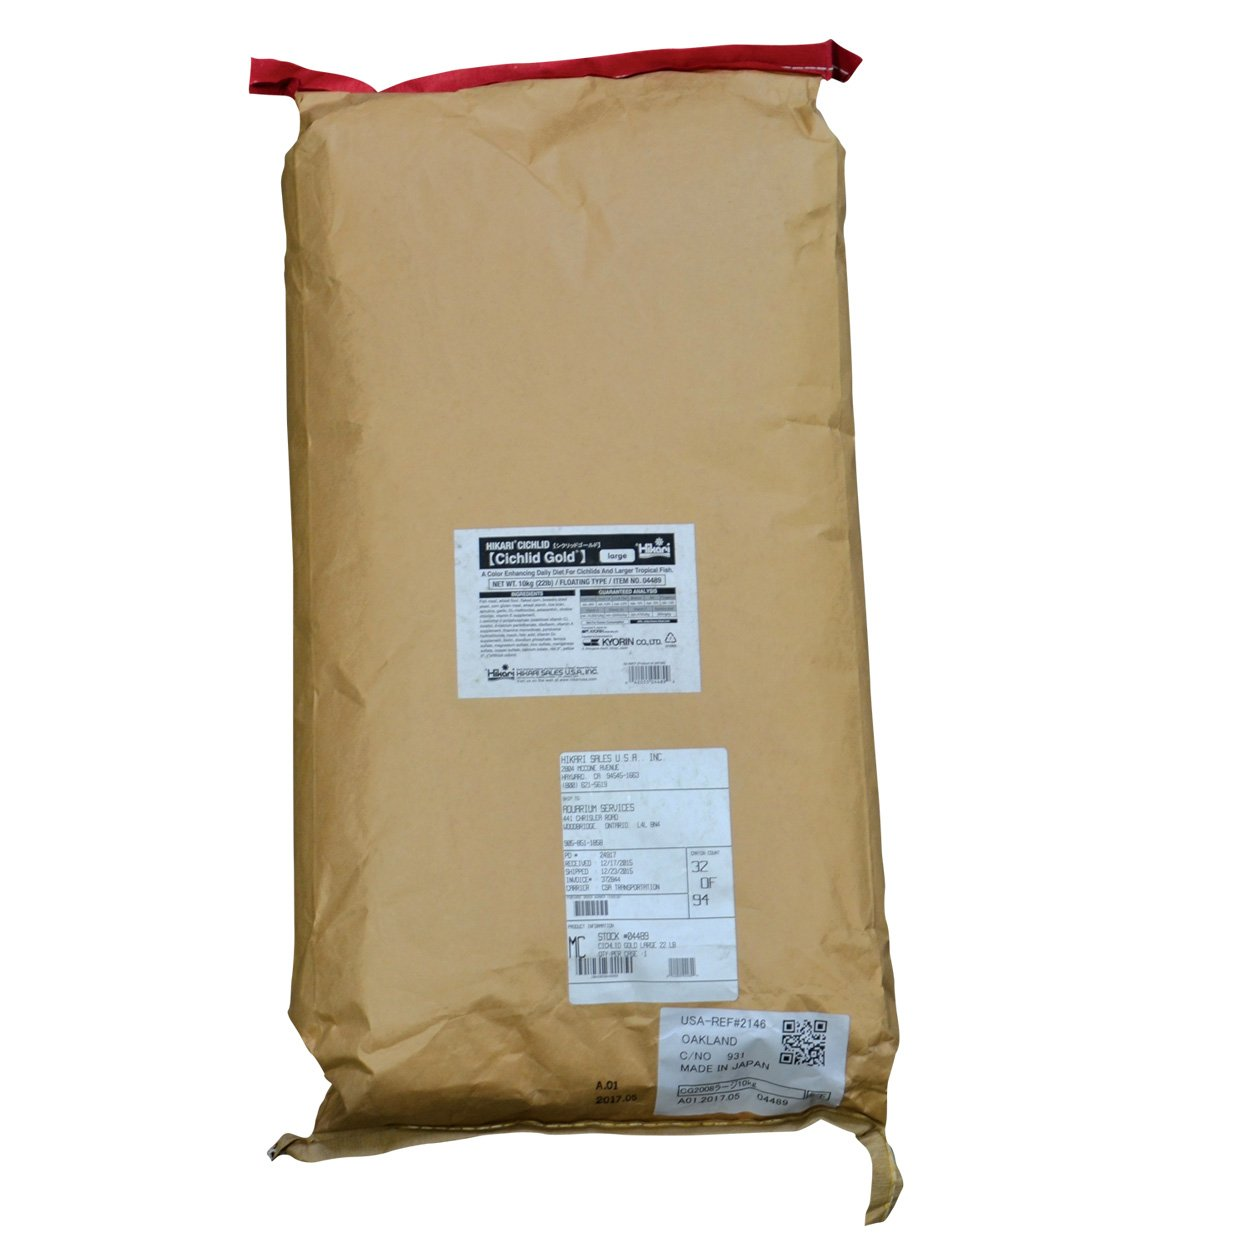 Hikari 69653 Cichlid Gold, Large Pellets, 22 lb